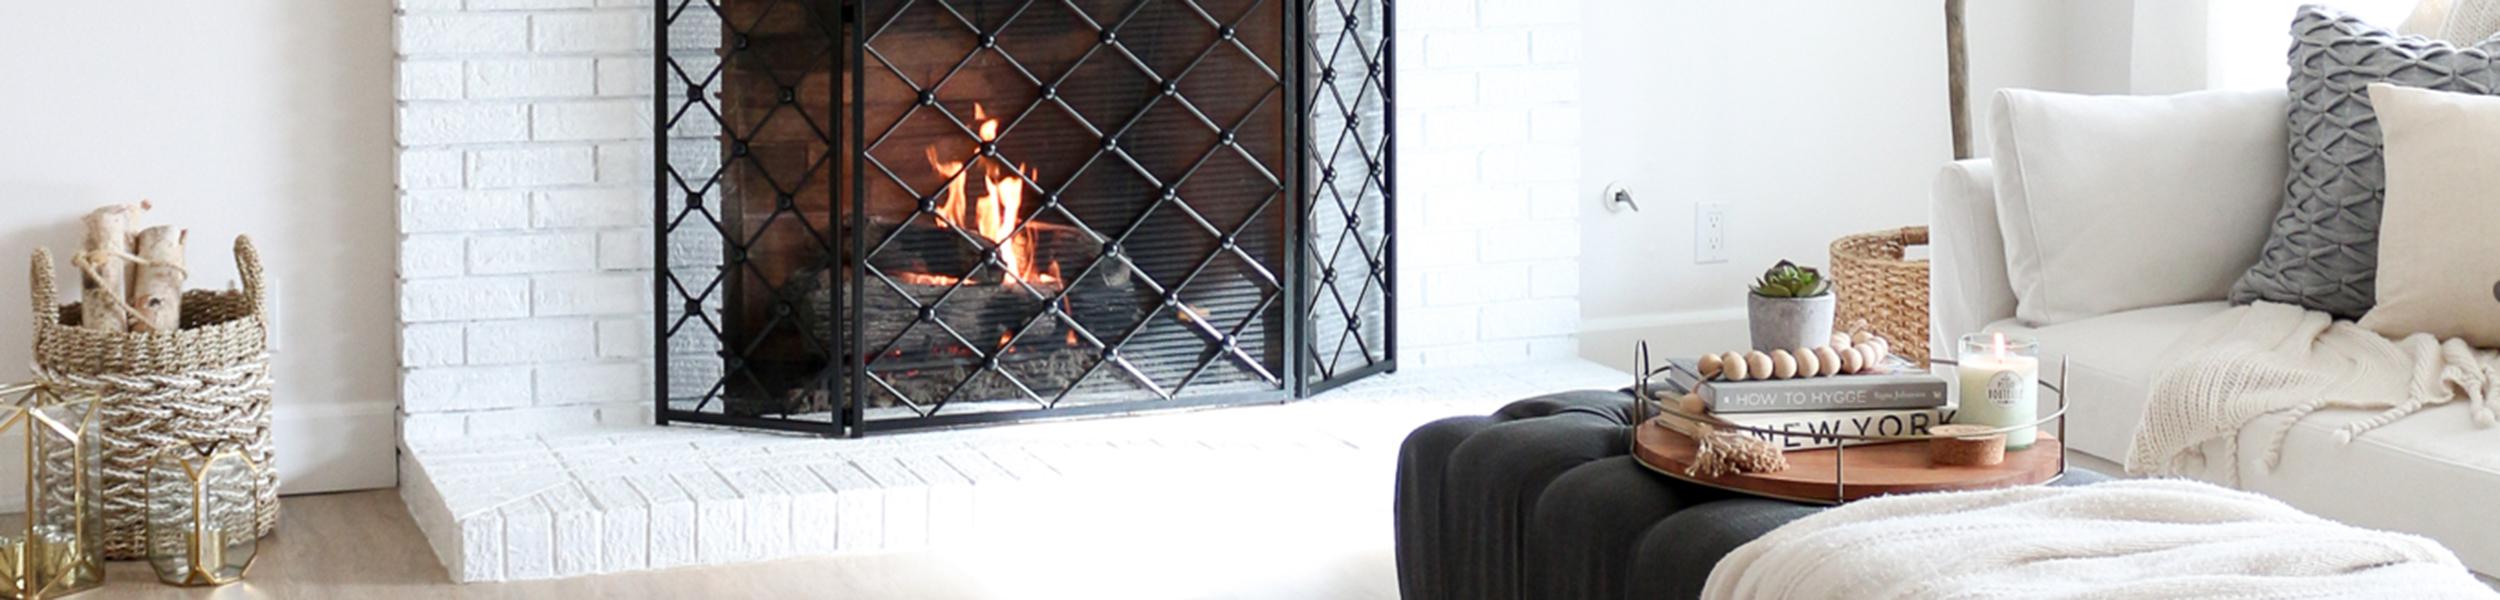 cozy-fireplace-living-room-hygge-1111lightlane11